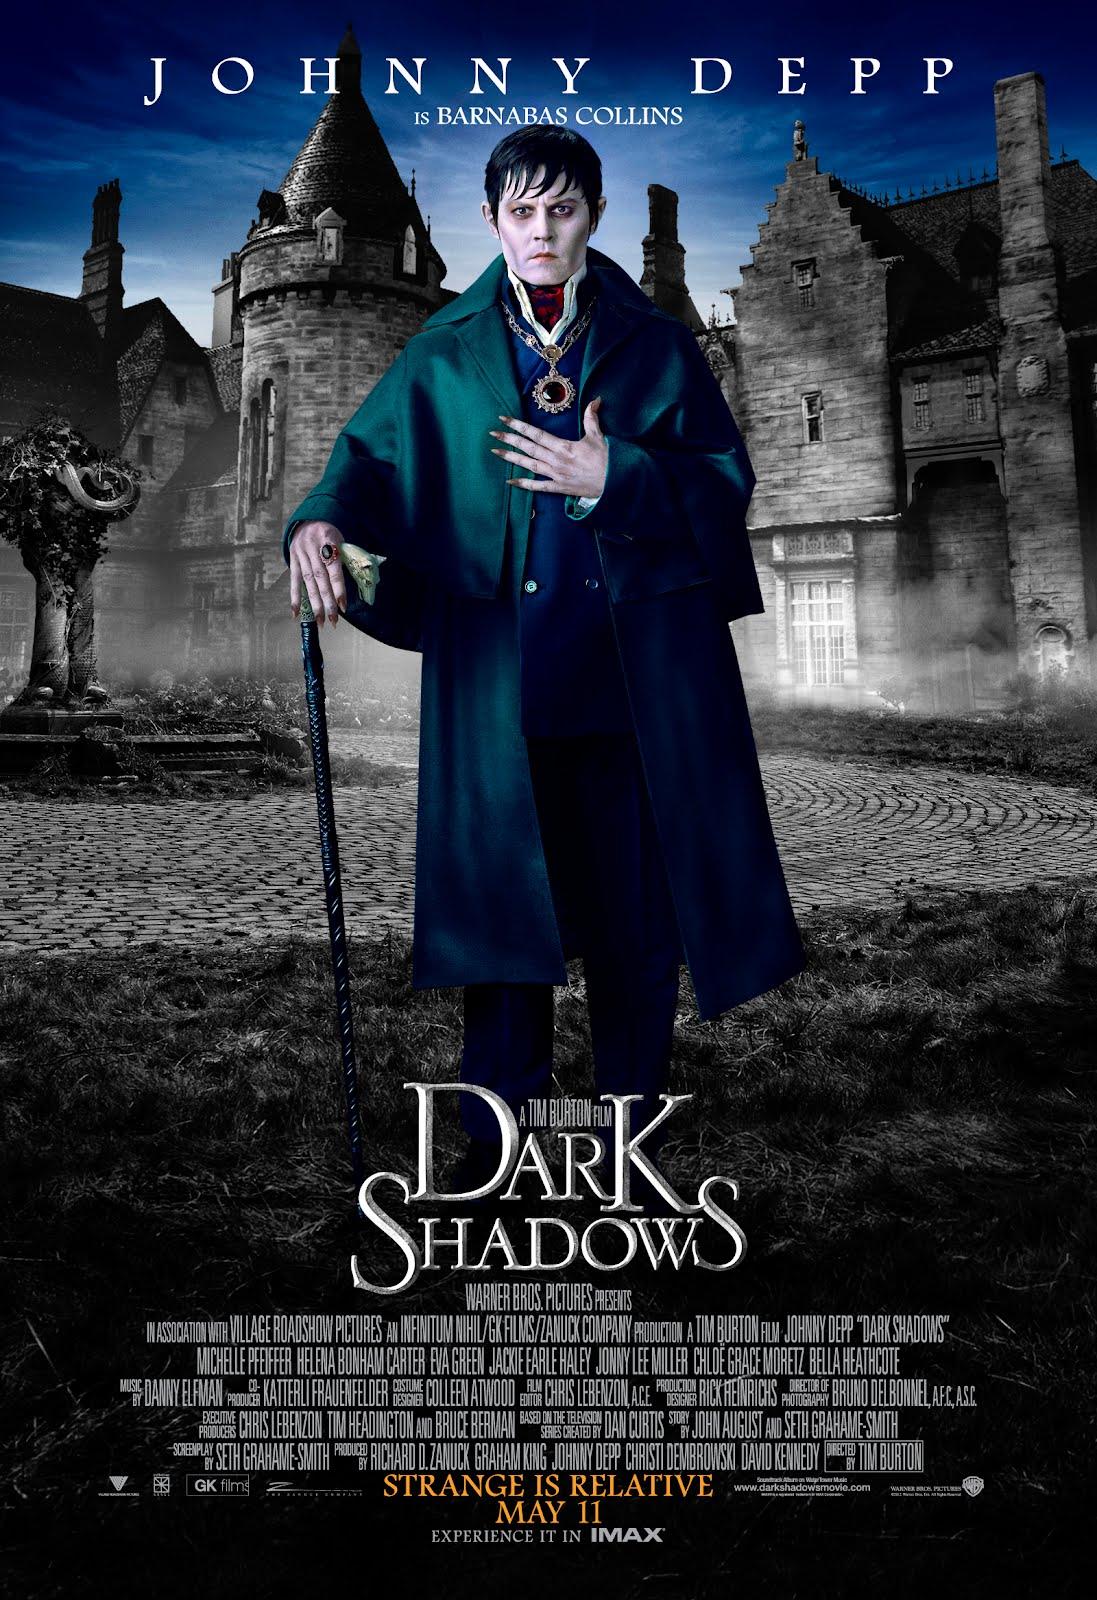 http://3.bp.blogspot.com/-OsURrQpQodw/T3y5VYarzPI/AAAAAAAAQ3k/0Ob2VecEodI/s1600/dark-shadows-character-poster-banner-johnny-depp.jpg